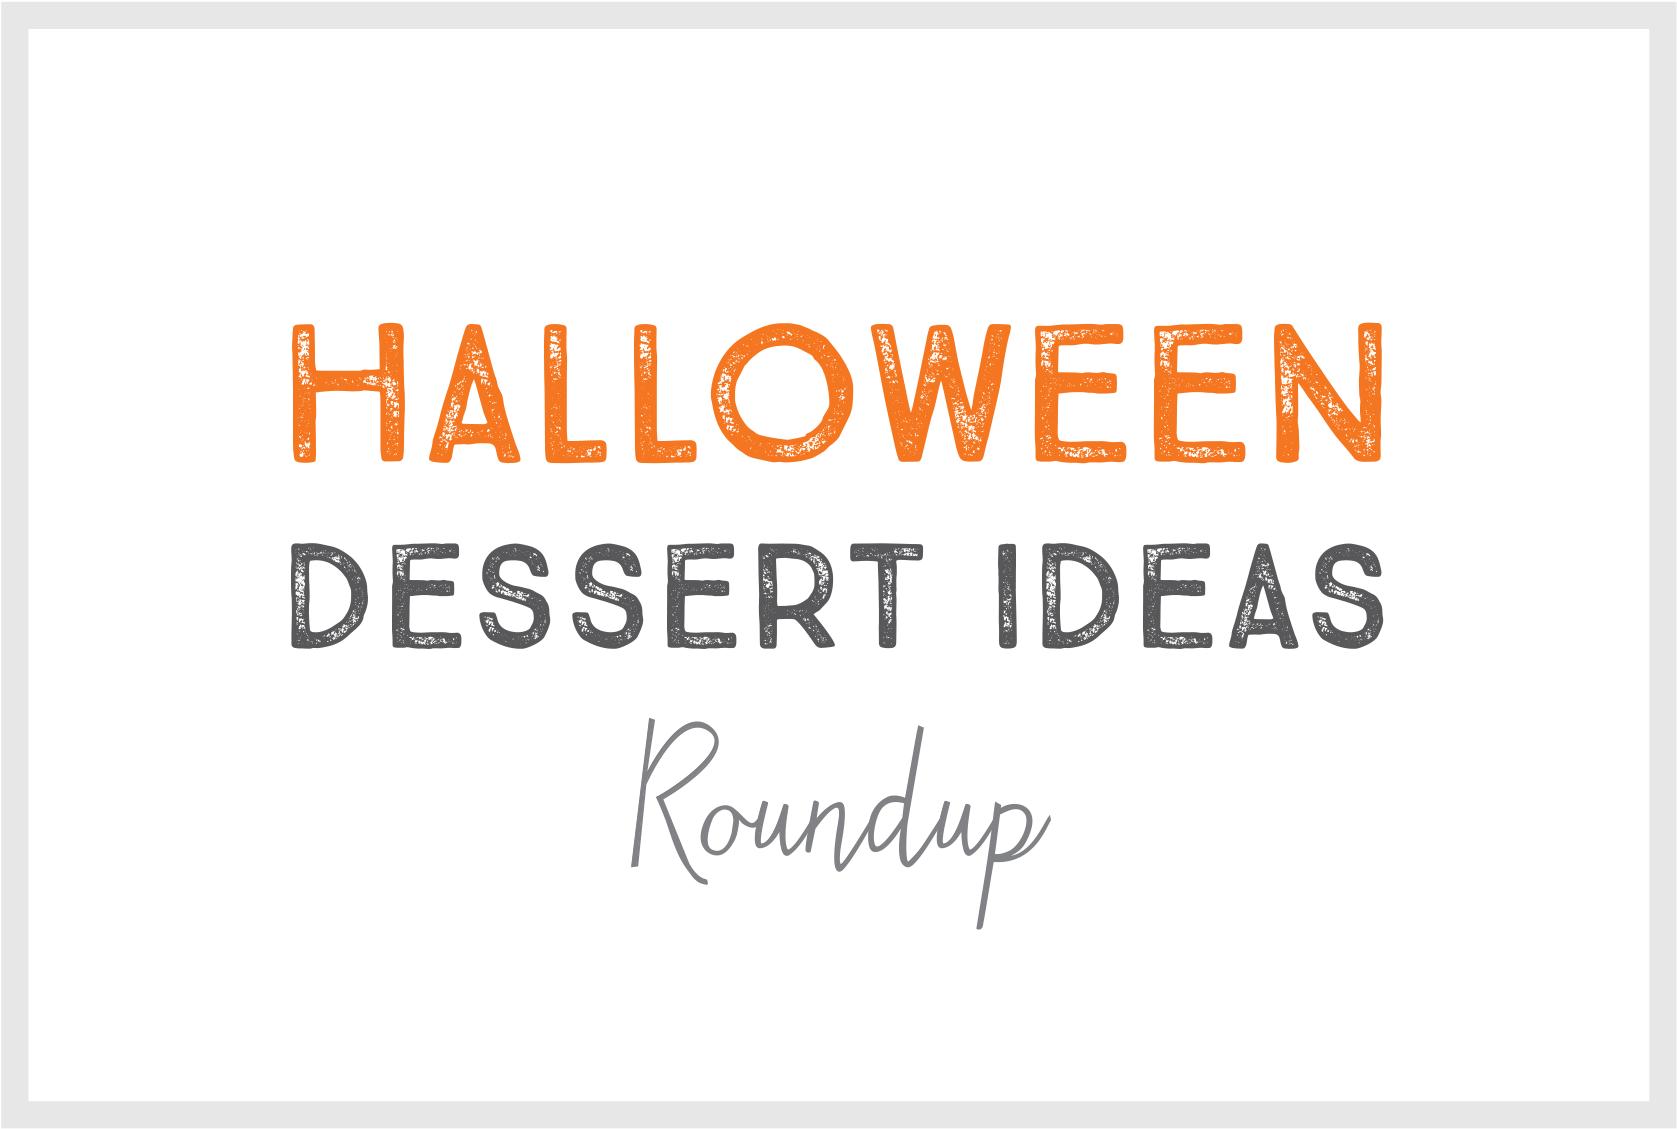 Title from the roundup, Halloween Dessert Ideas.